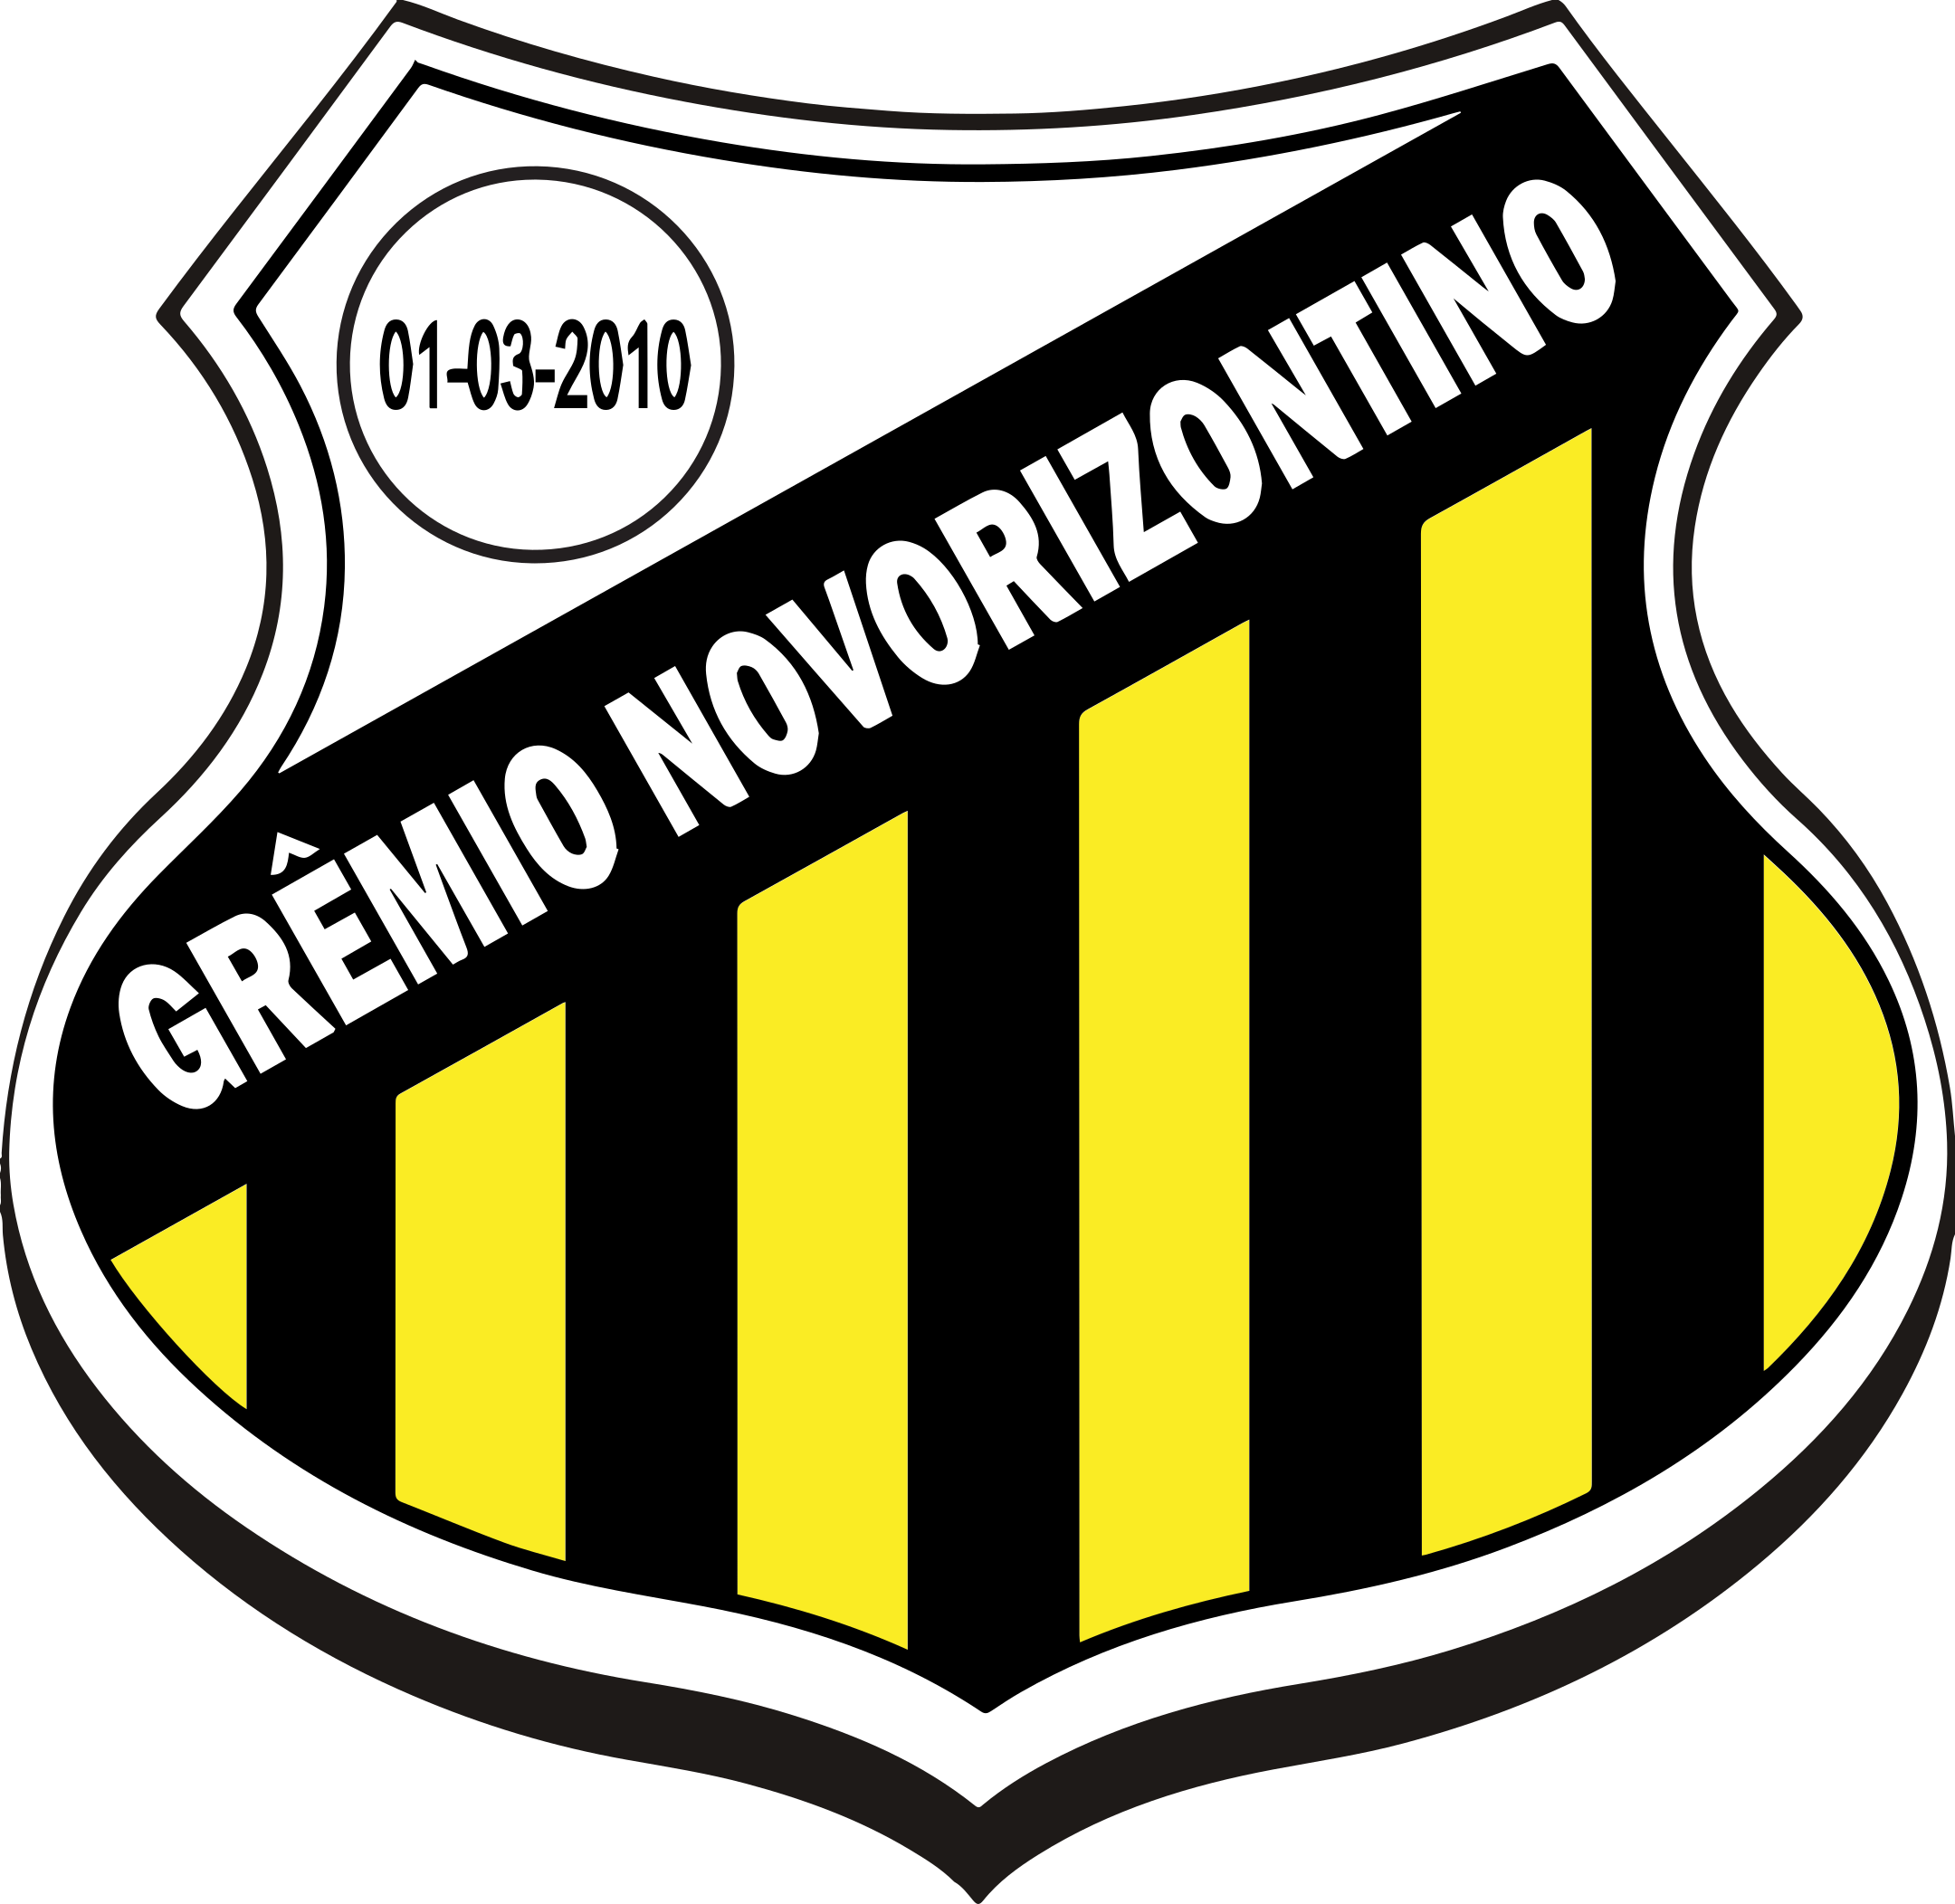 gremio novorizontino logo escudo 1 - Grêmio Novorizontino Logo